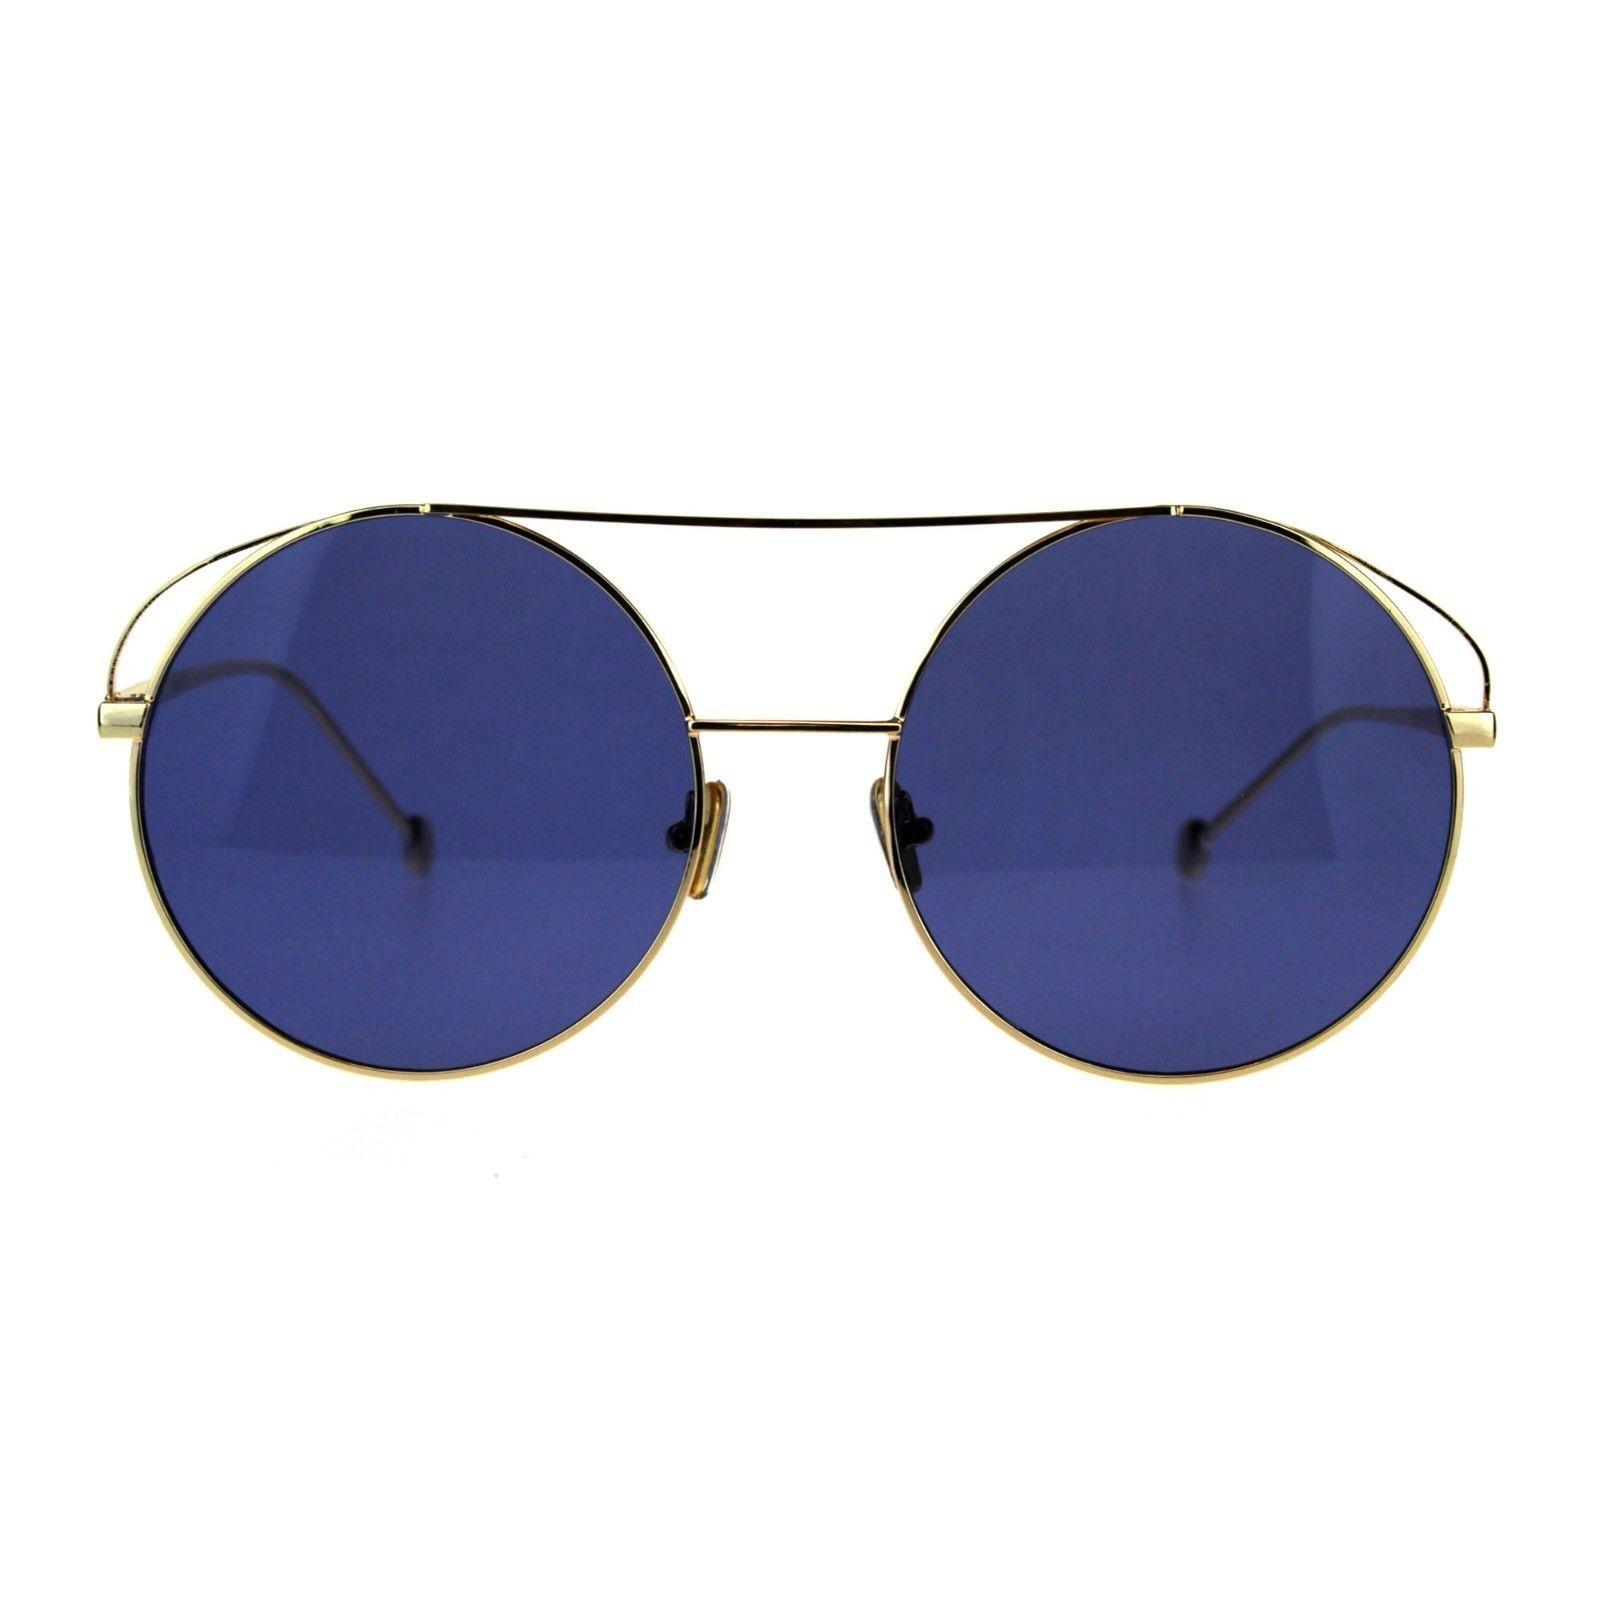 Womens Round Circle Sunglasses Double Bridge Metal Frame UV 400